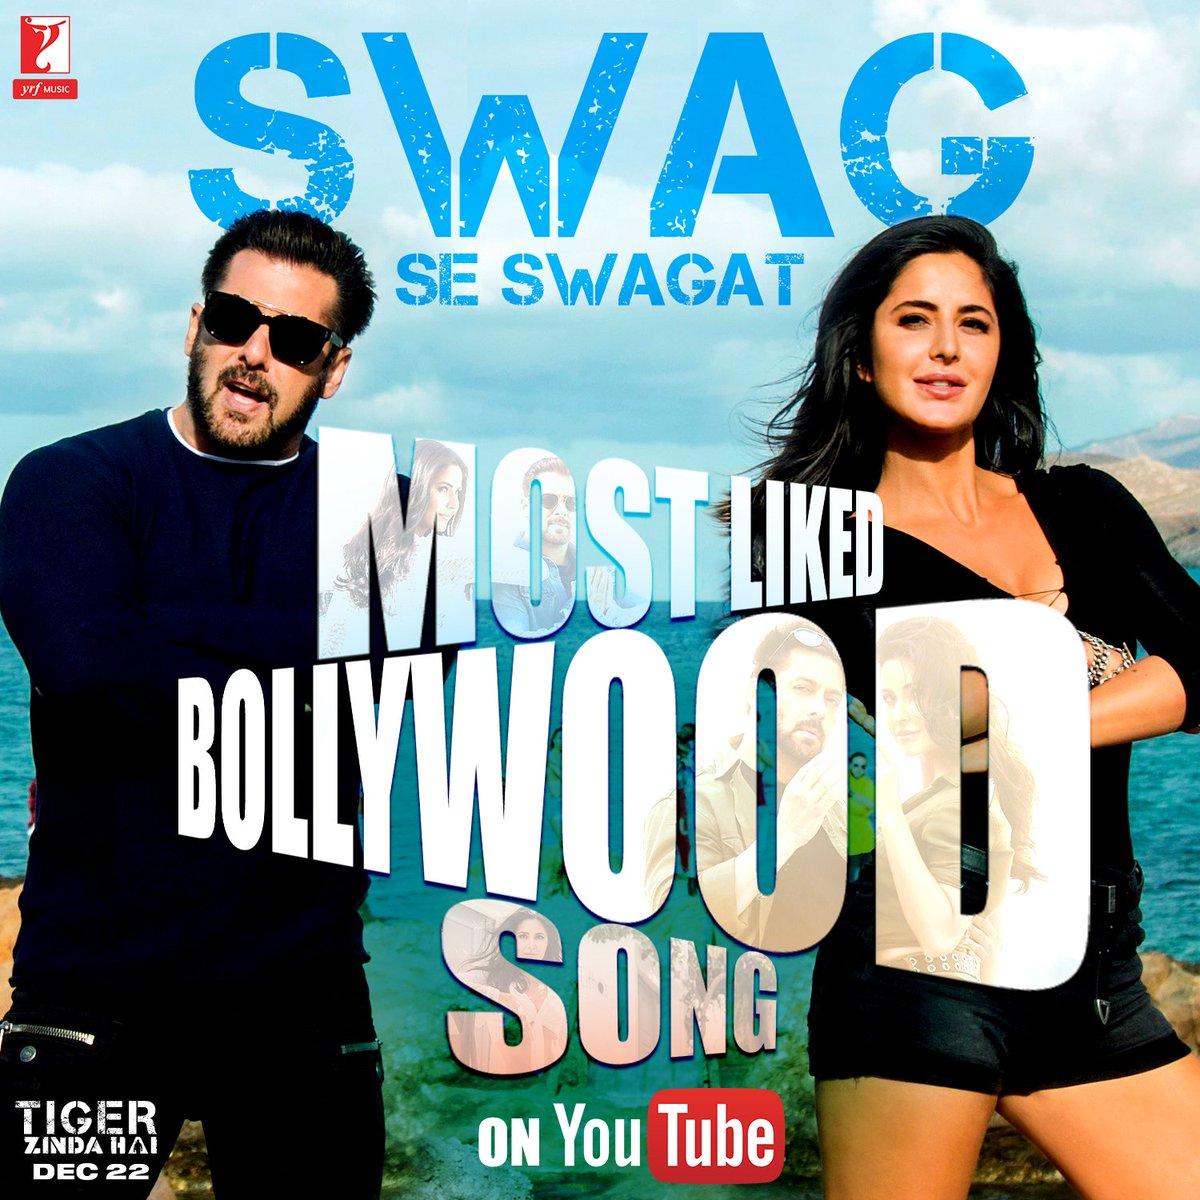 test Twitter Media - With 1 MILLION+ likes, #SwagSeSwagat becomes the MOST LIKED BOLLYWOOD SONG on @YouTube. Rewatch & dance along: https://t.co/JxHRodt8Fd 😍🔥 @BeingSalmanKhan #KatrinaKaif @VishalDadlani @ShekharRavjiani @nehabhasin4u @VMVMVMVMVM @Irshad_Kamil @TigerZindaHai https://t.co/soOiH4bJmB